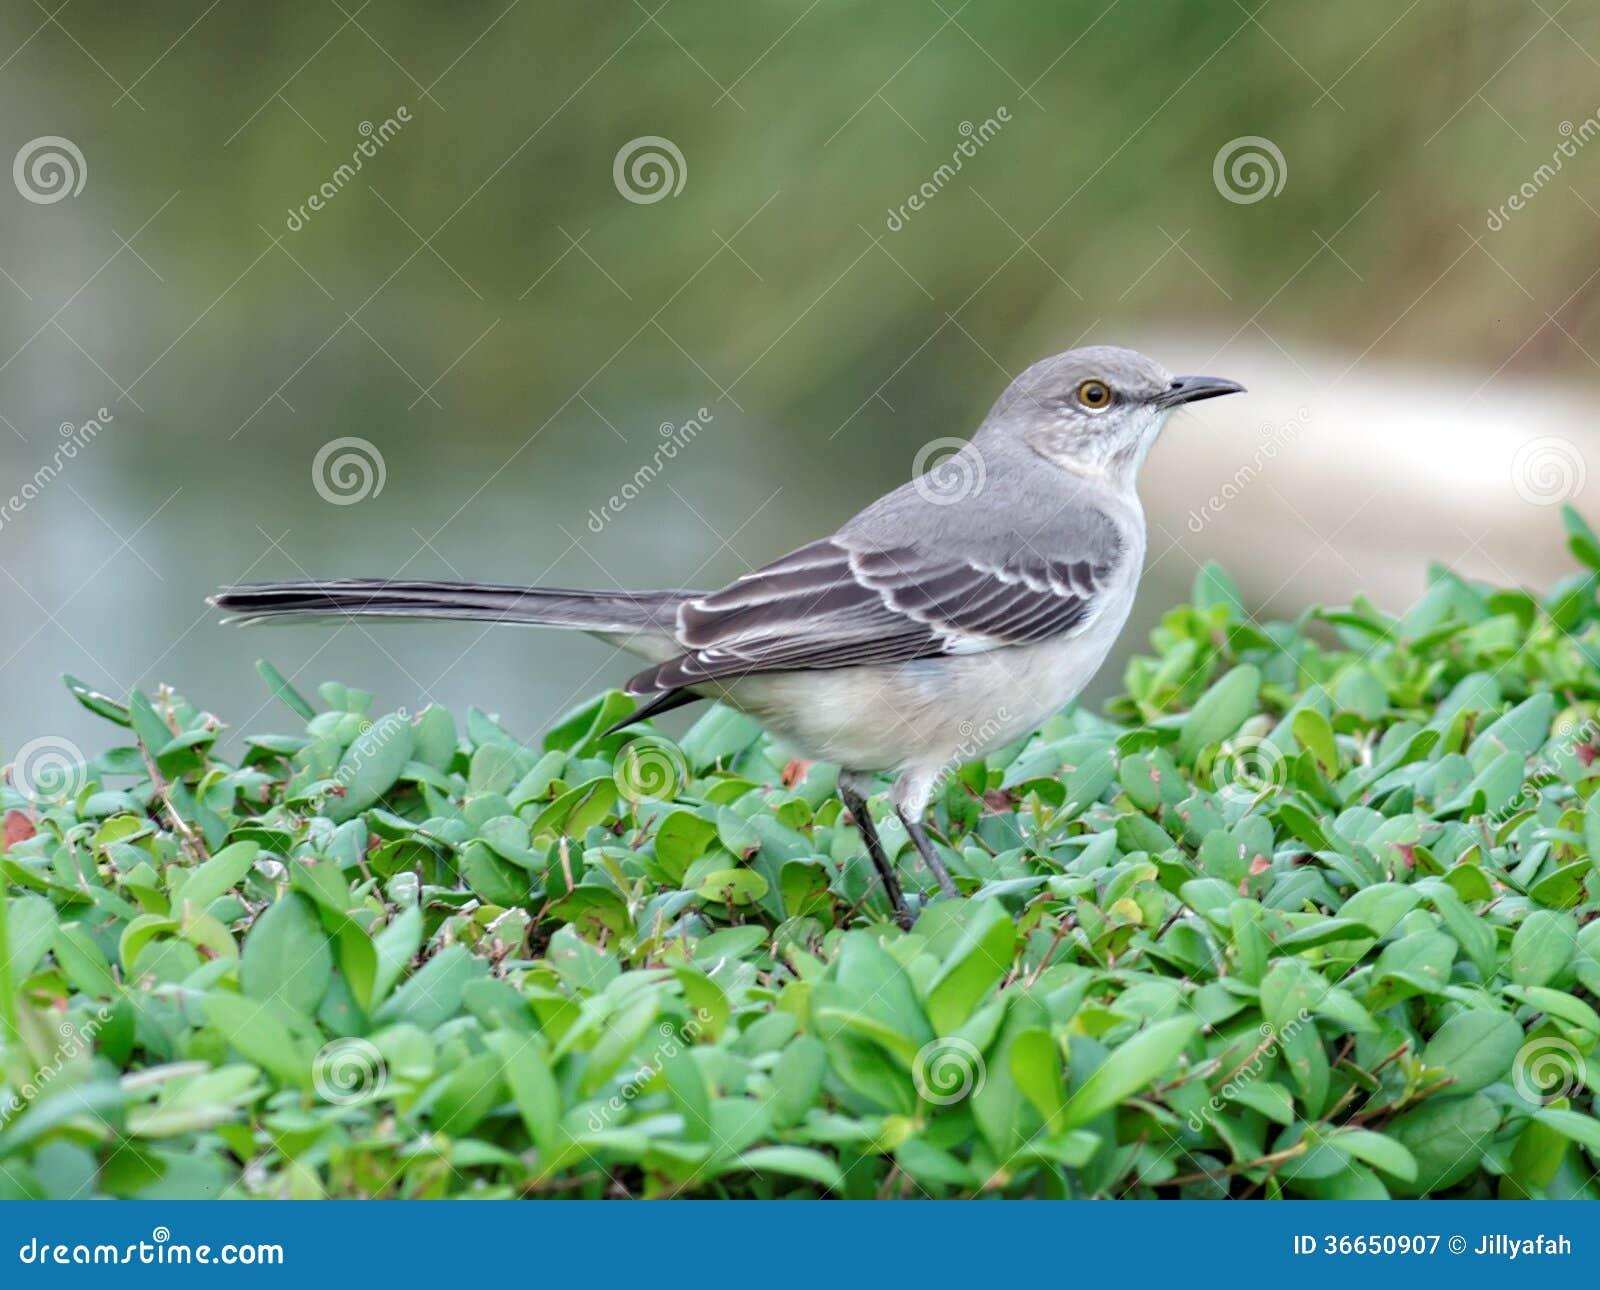 florida state bird northern mockingbird - Mocking Bird Download